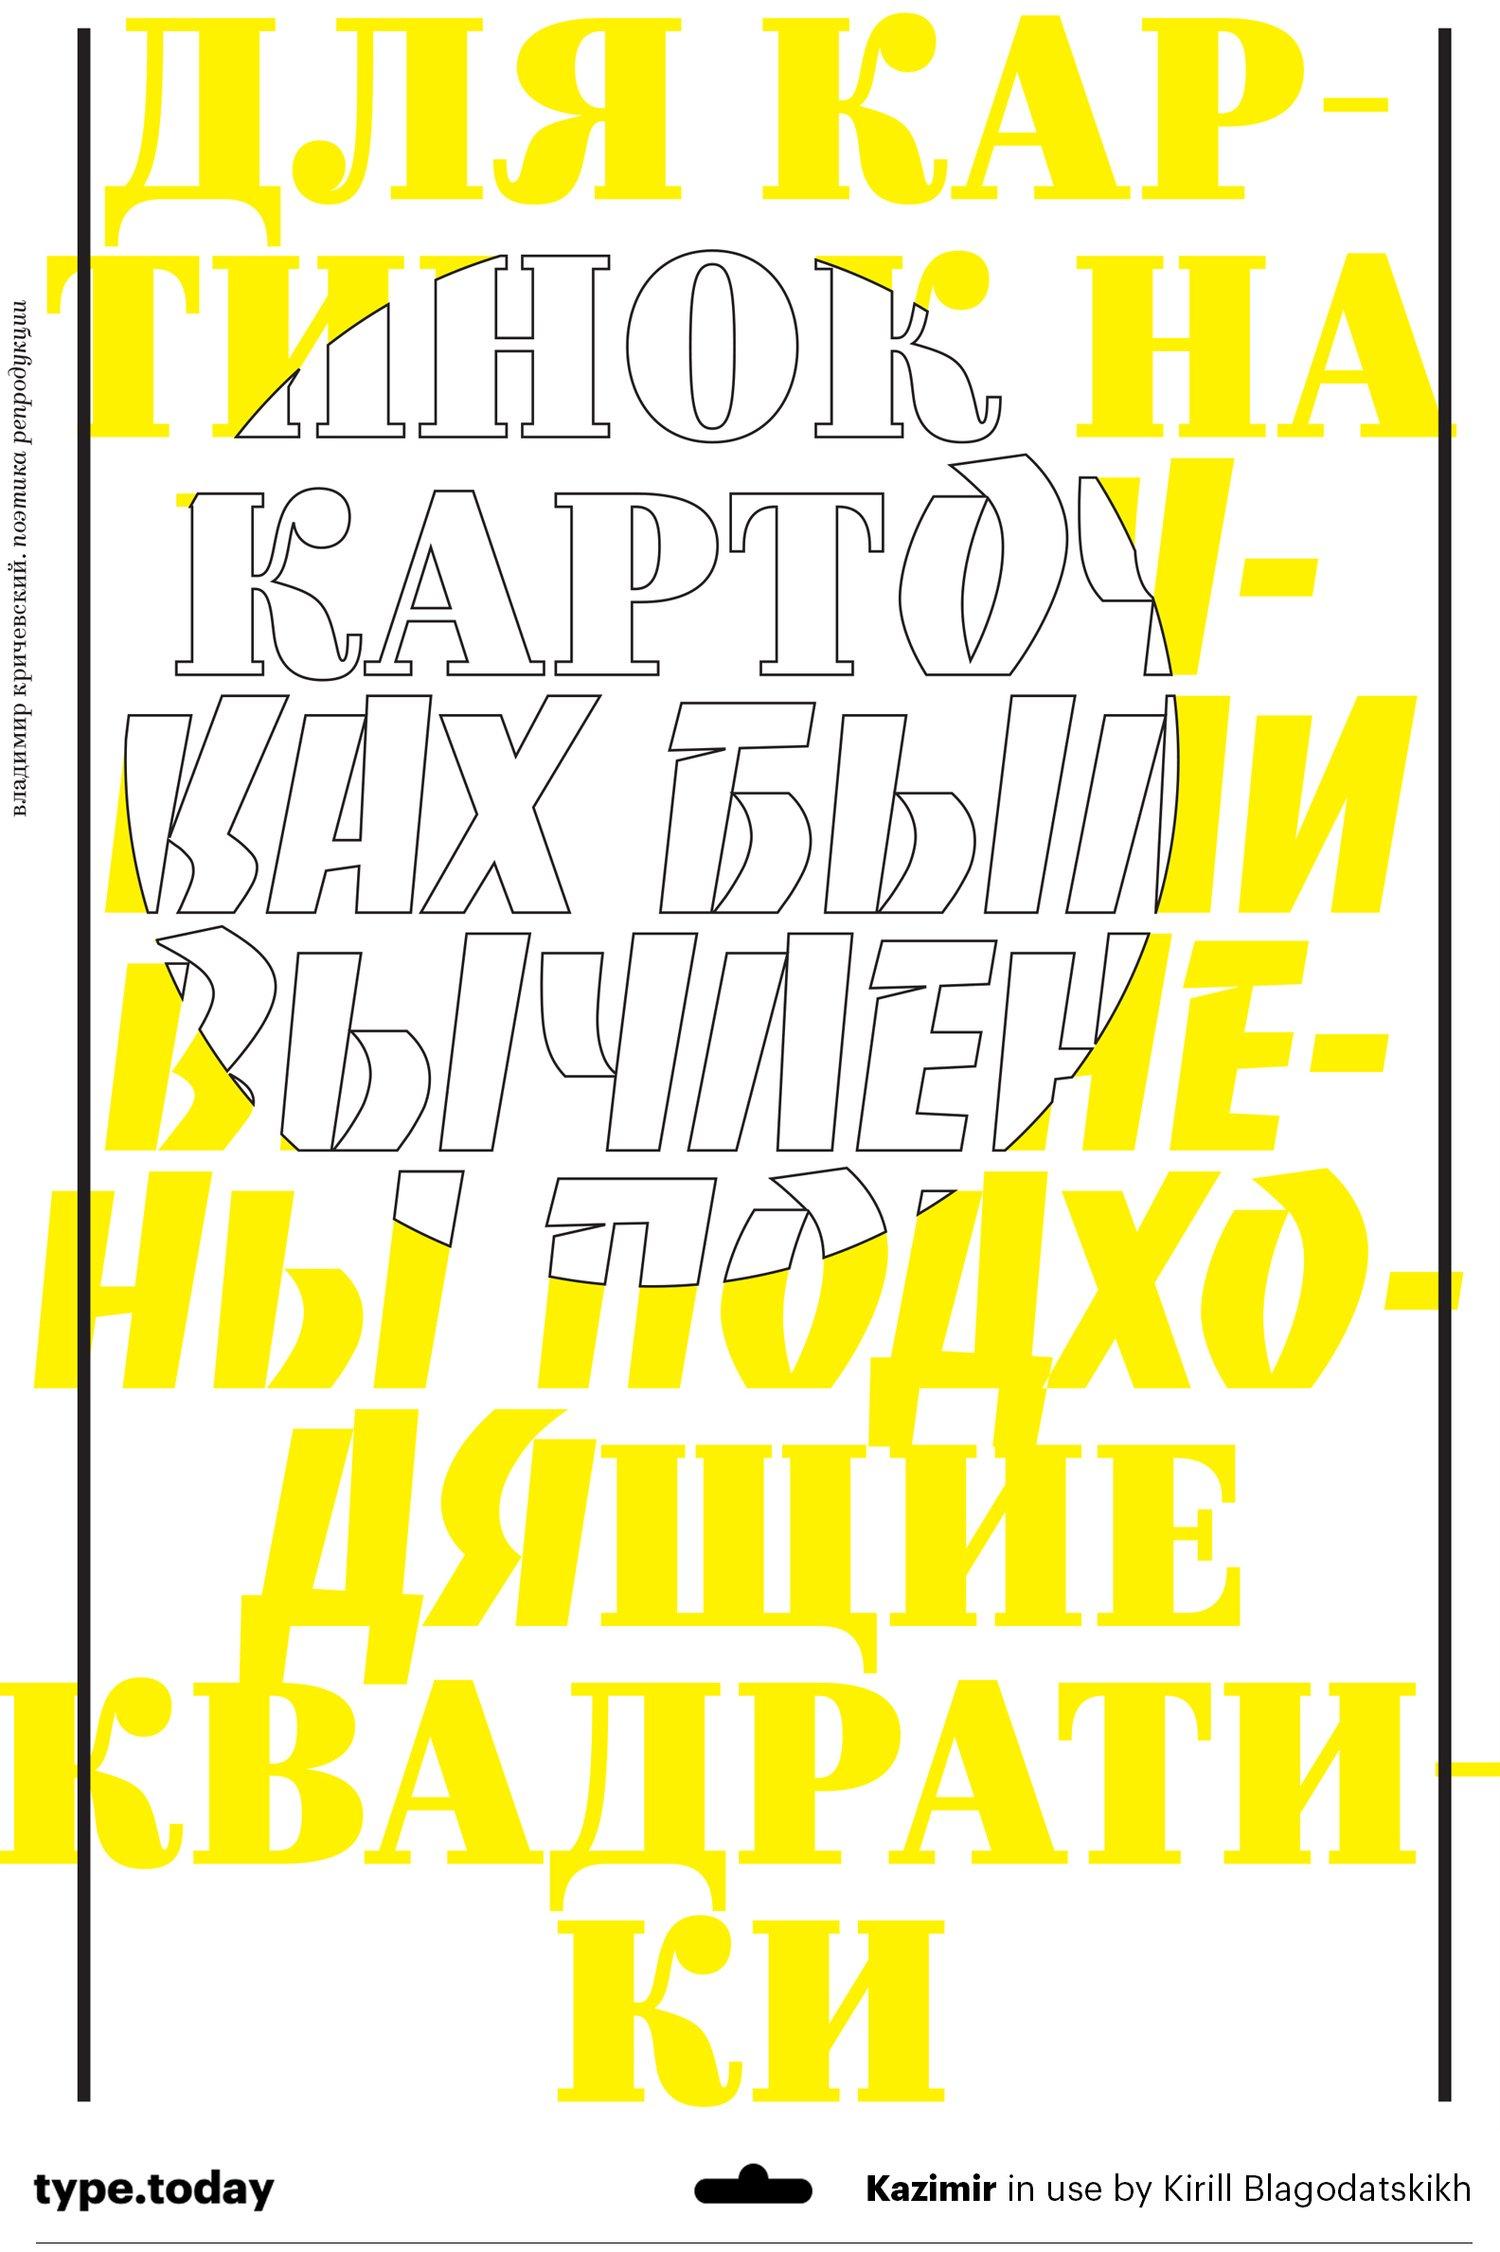 TT_Kazimir_BlagodatskihWeb3